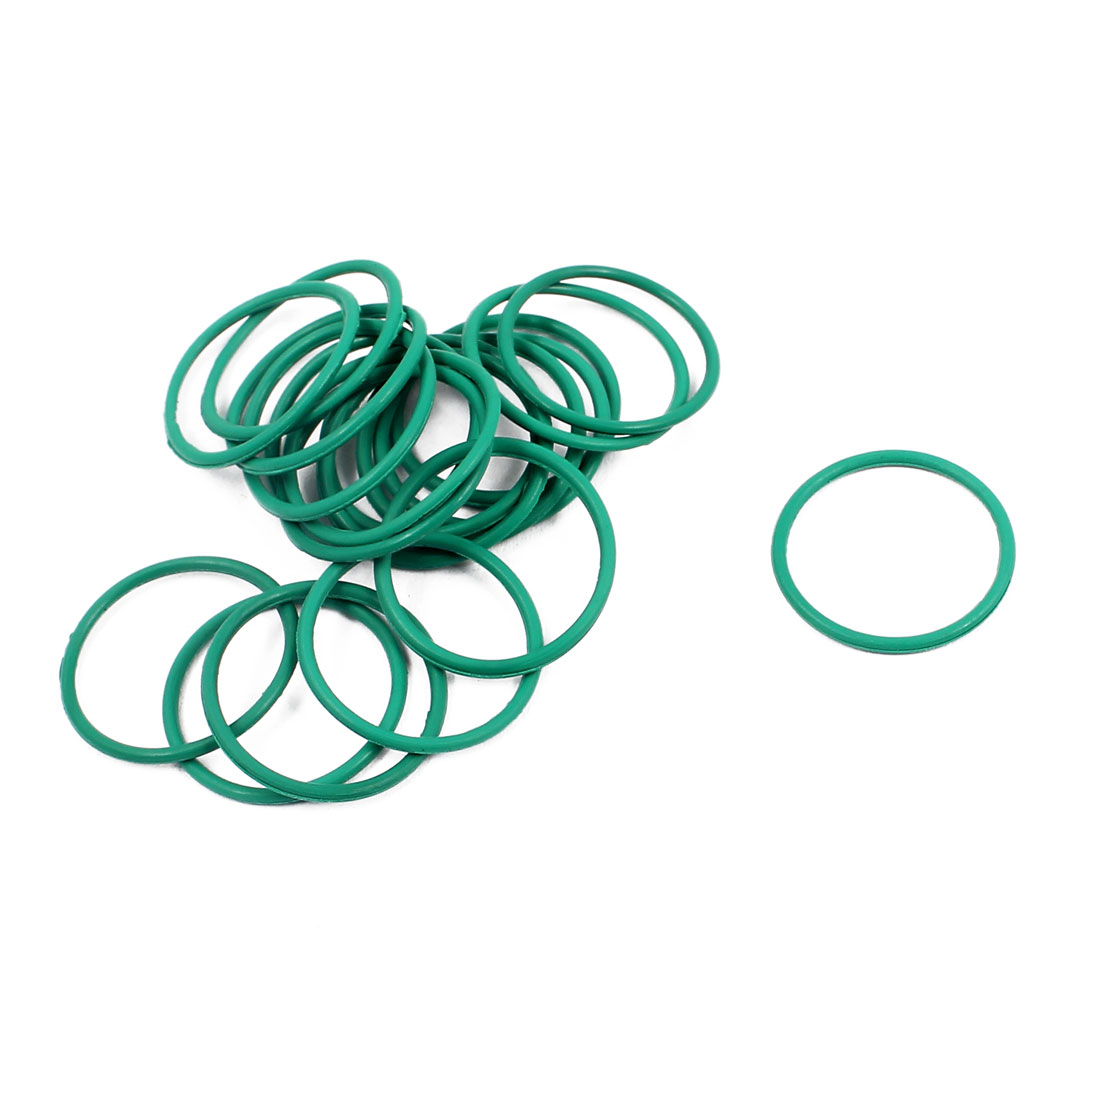 20Pcs 15mm x 1mm FKM Fluoro RubberO-rings Heat Resistant Sealing Ring Grommets